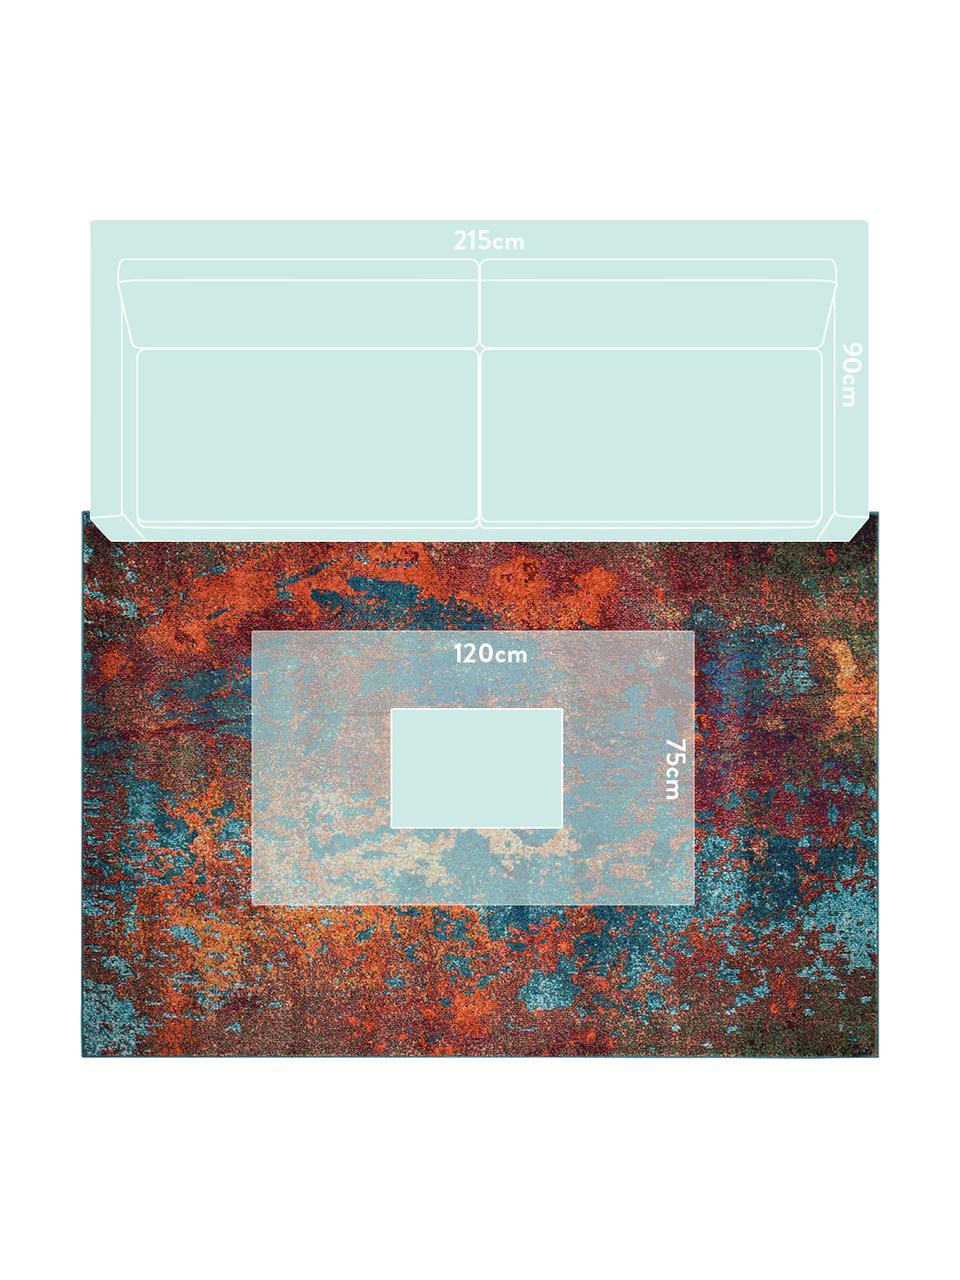 Designteppich Celestial in Bunt, Flor: 100% Polypropylen, Rottöne, Blautöne, Grün, B 160 x L 220 cm (Größe M)